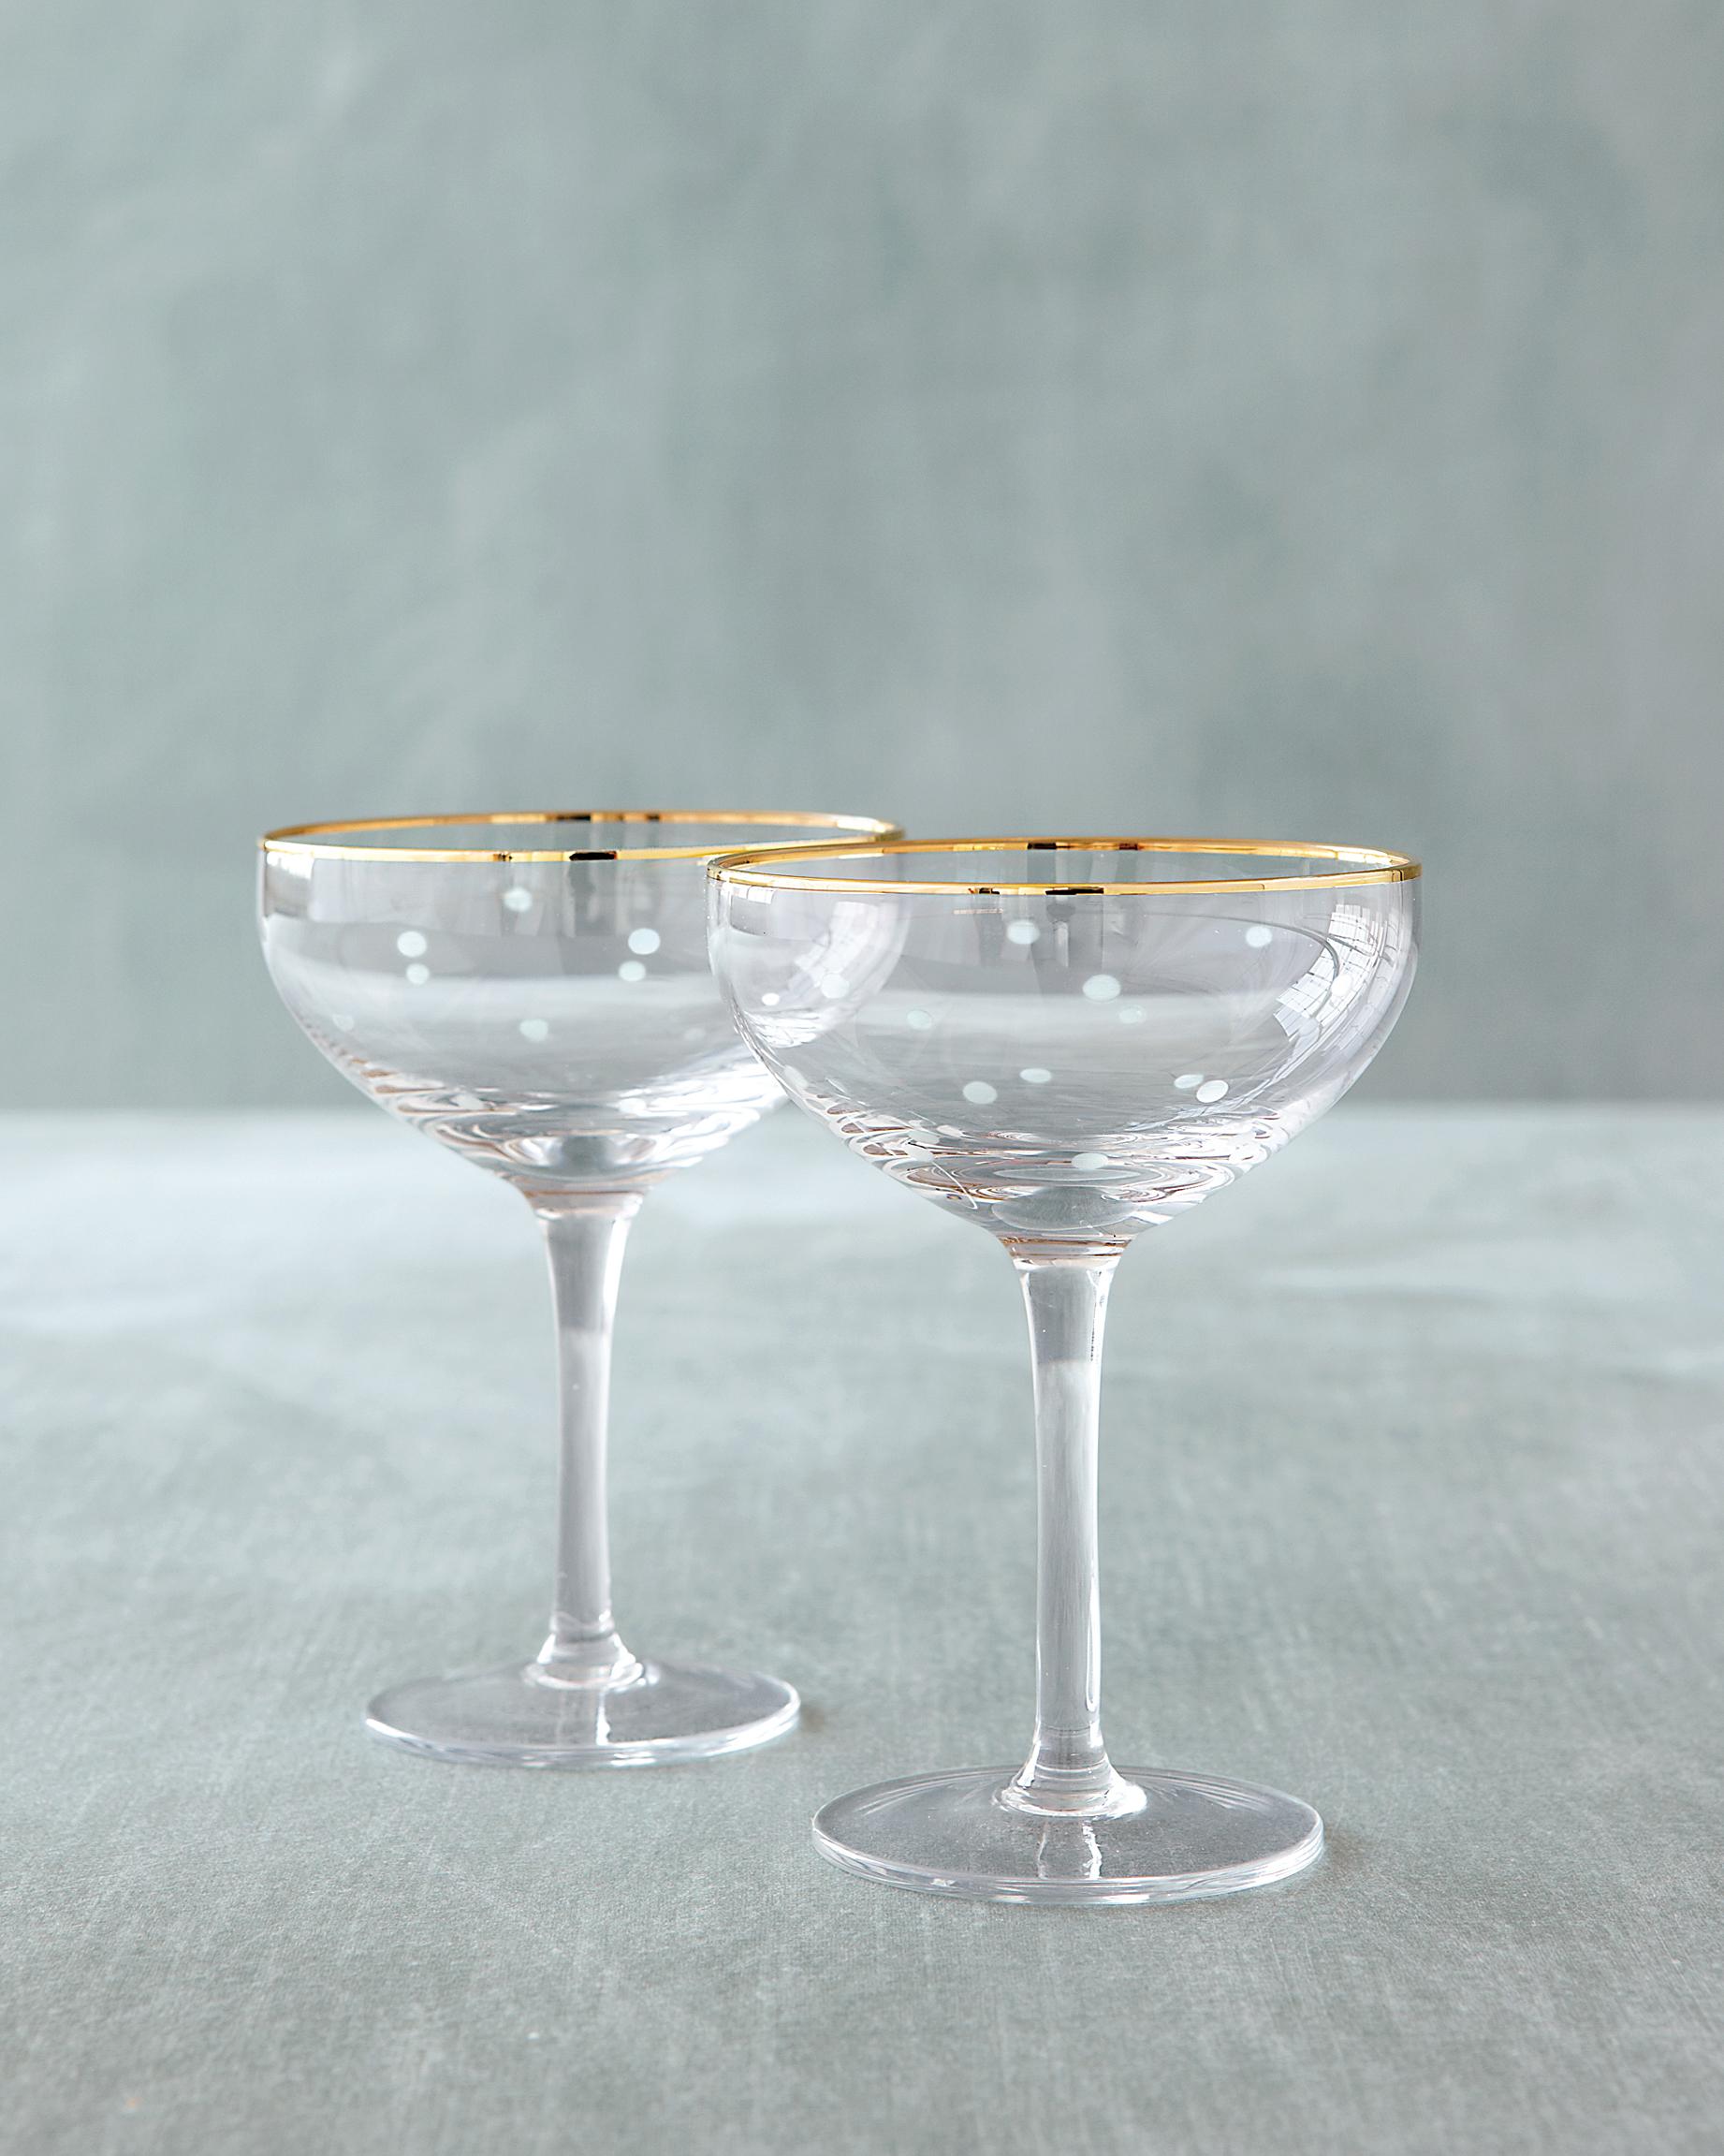 mini-saucer-glasses-0811mwd107434.jpg